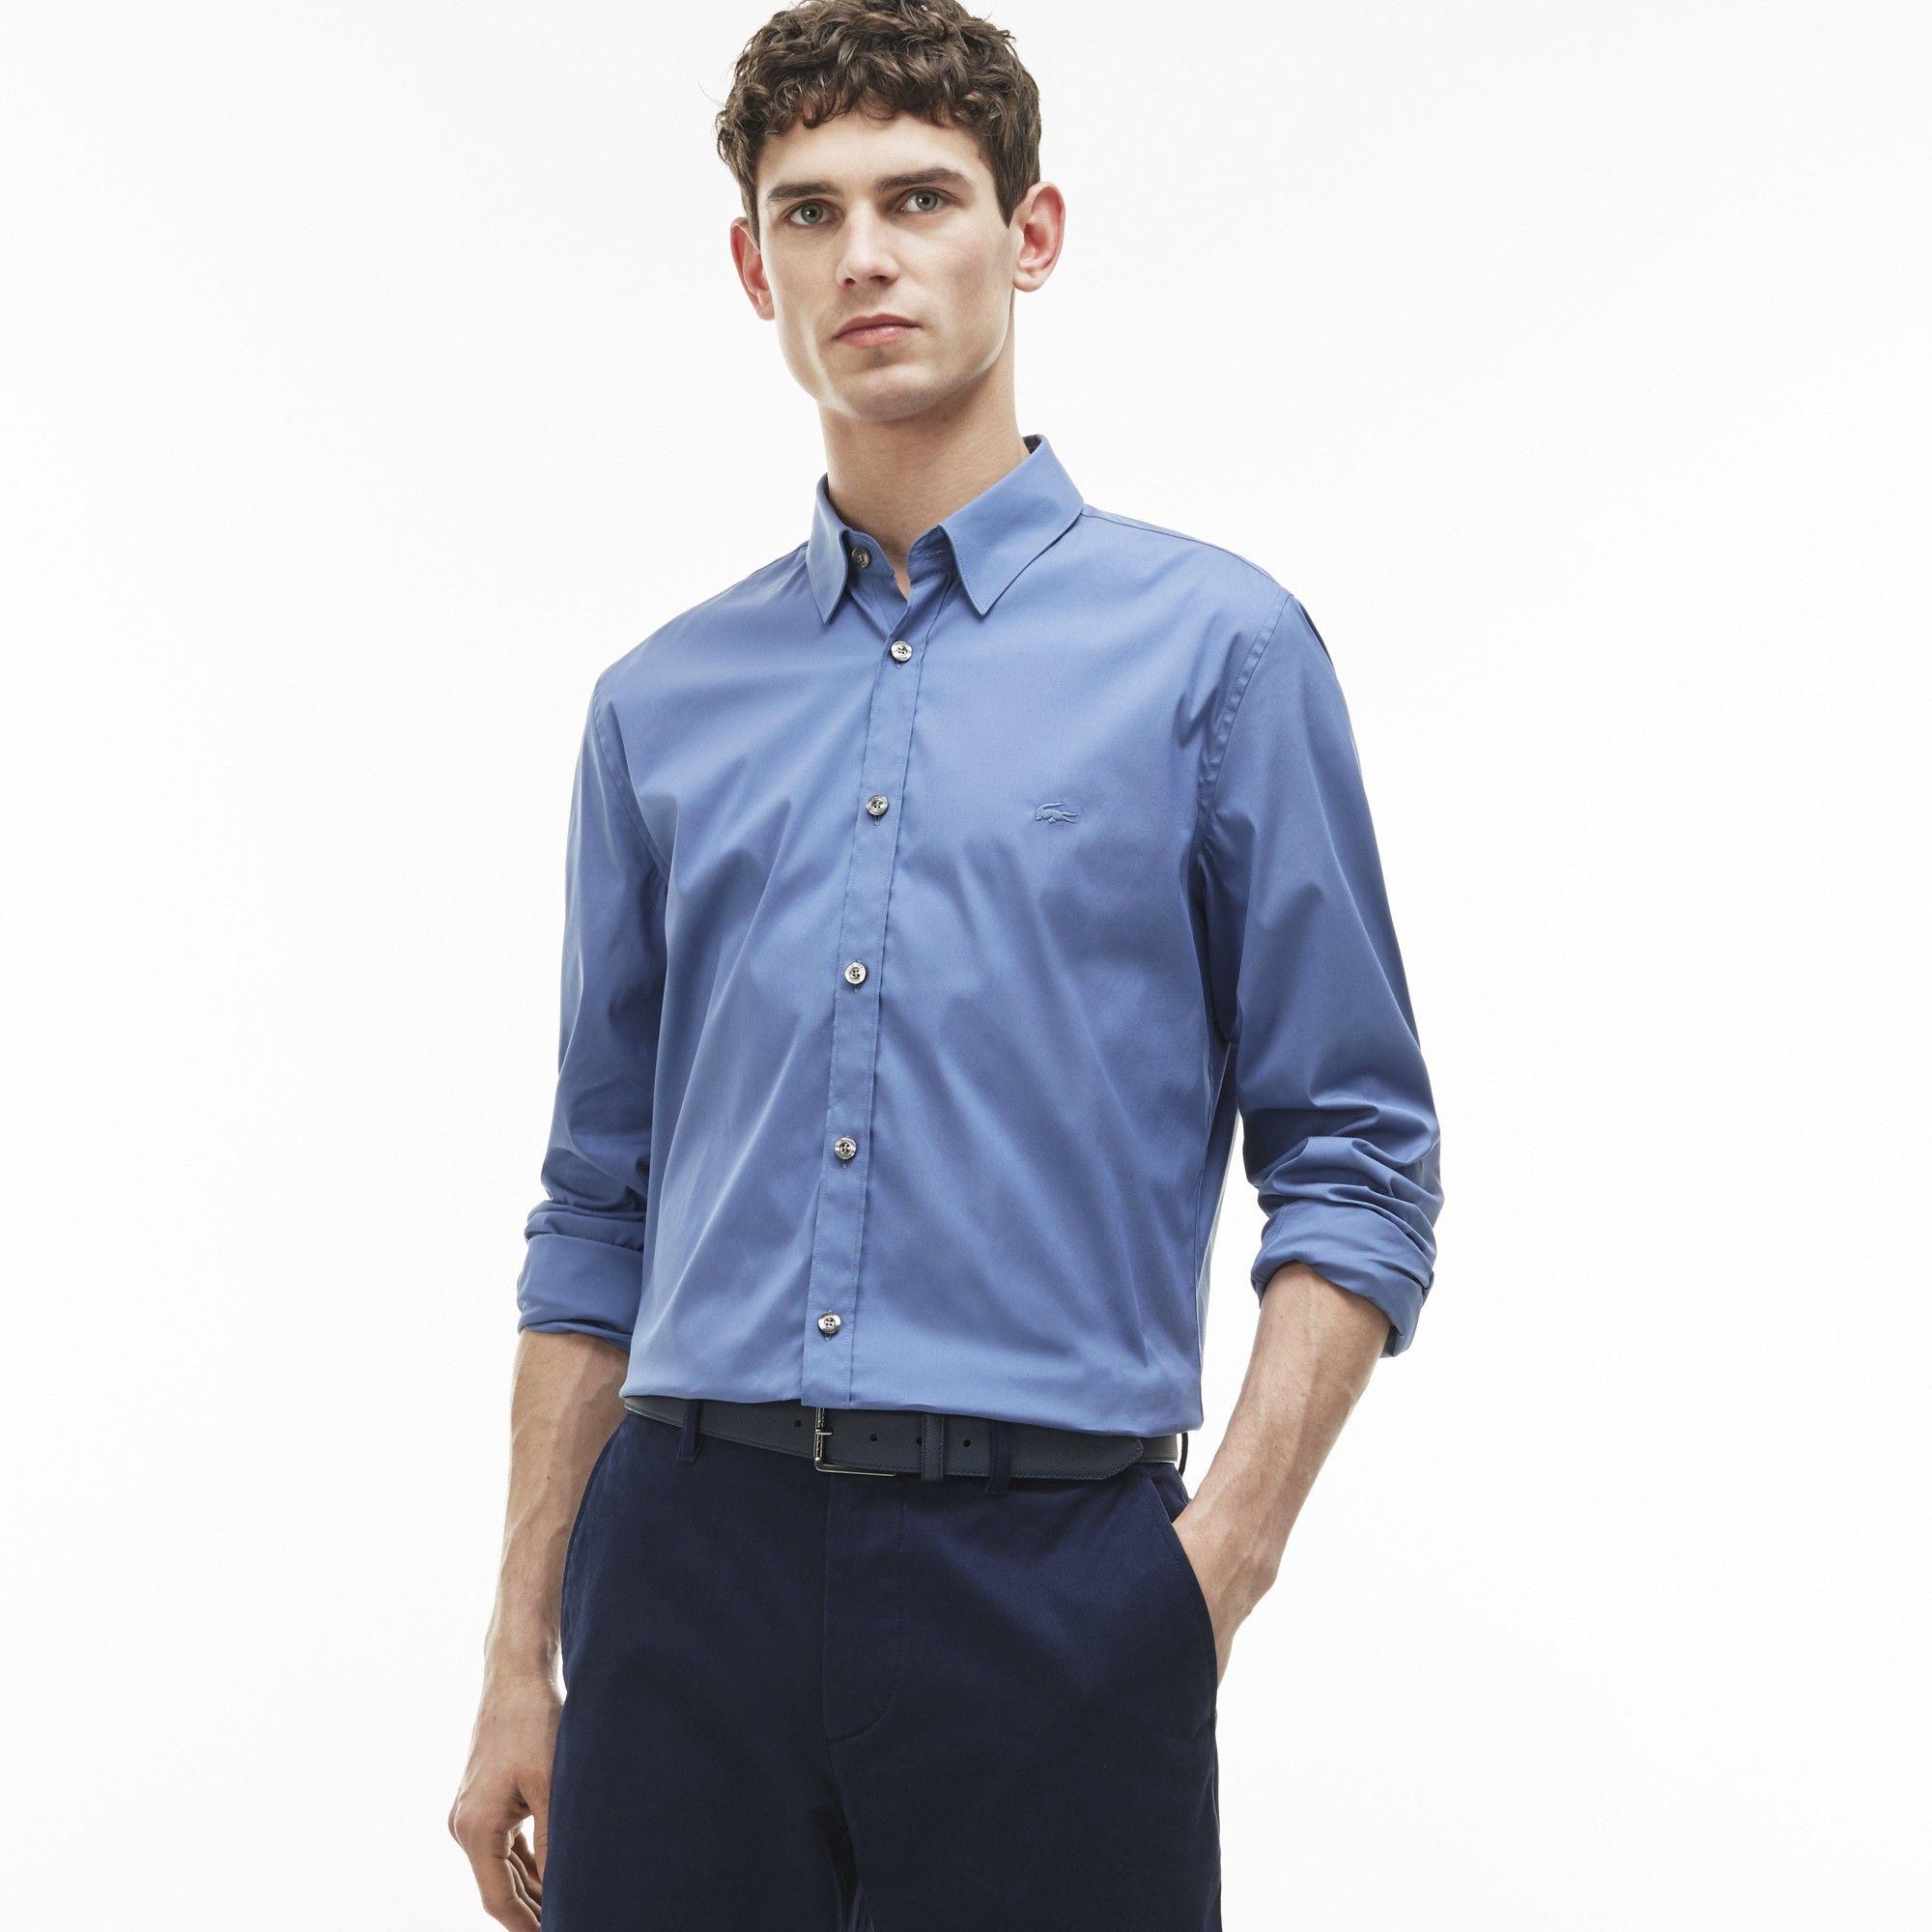 3574b0f197e5 LACOSTE Men s Slim Fit Stretch Cotton Poplin Shirt - avon.  lacoste  cloth